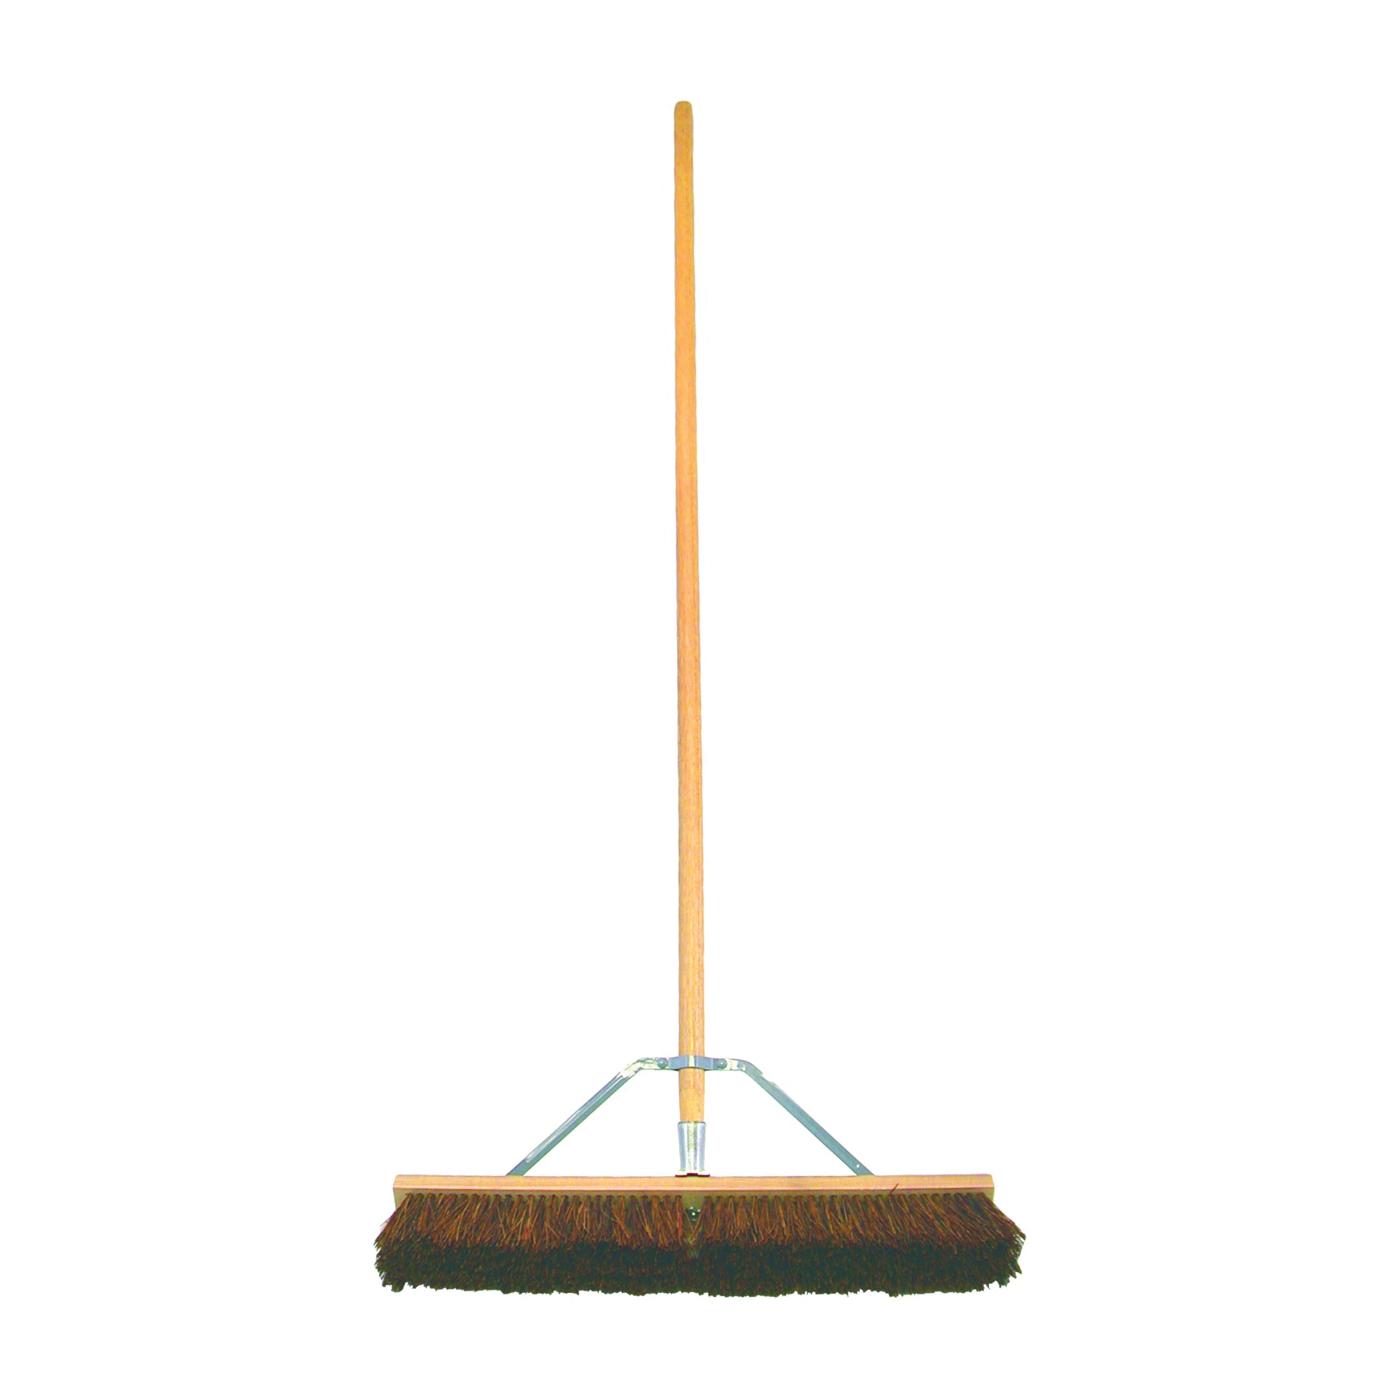 Picture of BIRDWELL 5024-4 Contractor Push Broom, 3 in L Trim, Natural Palmyra Fiber Bristle, Hardwood Handle